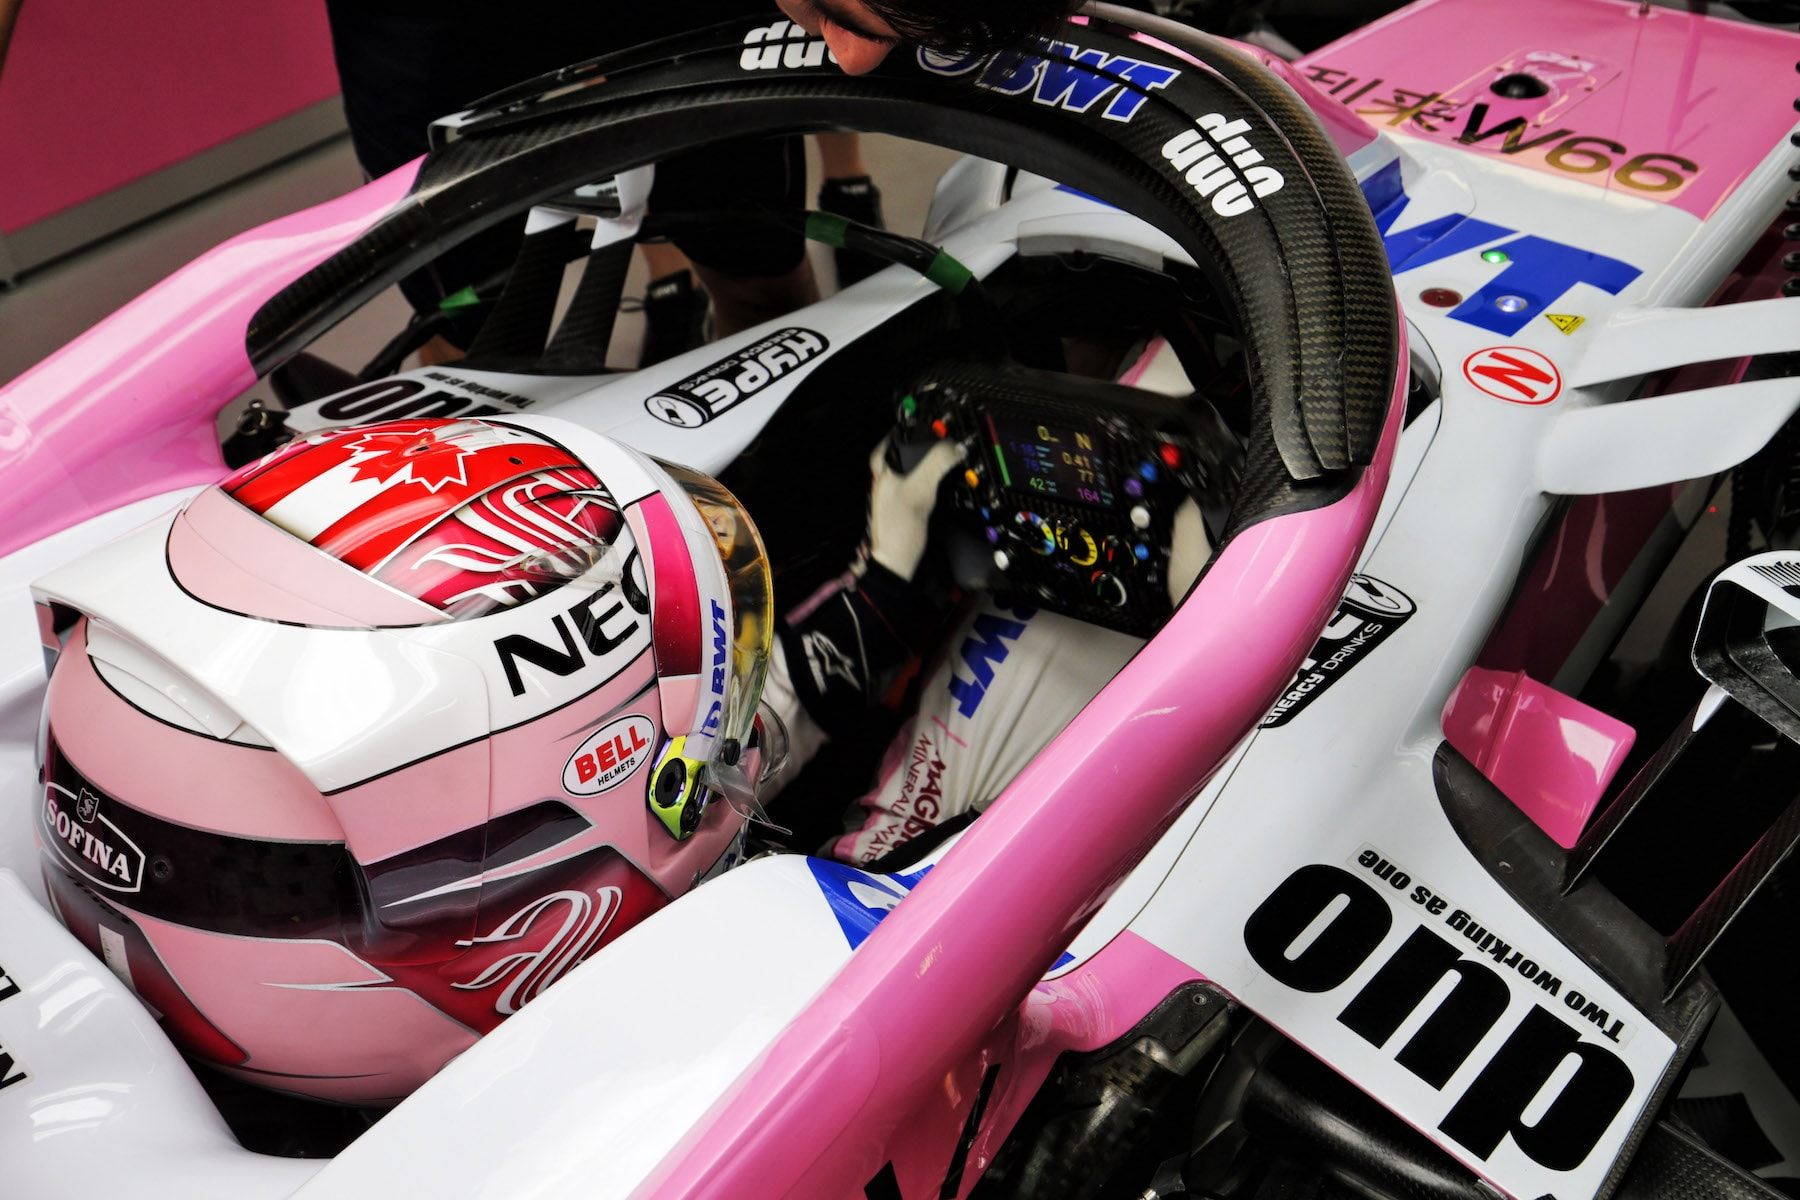 2018 Nicolas Latifi | Force India VJM11 | 2018 Russian GP FP1 1 copy.jpg